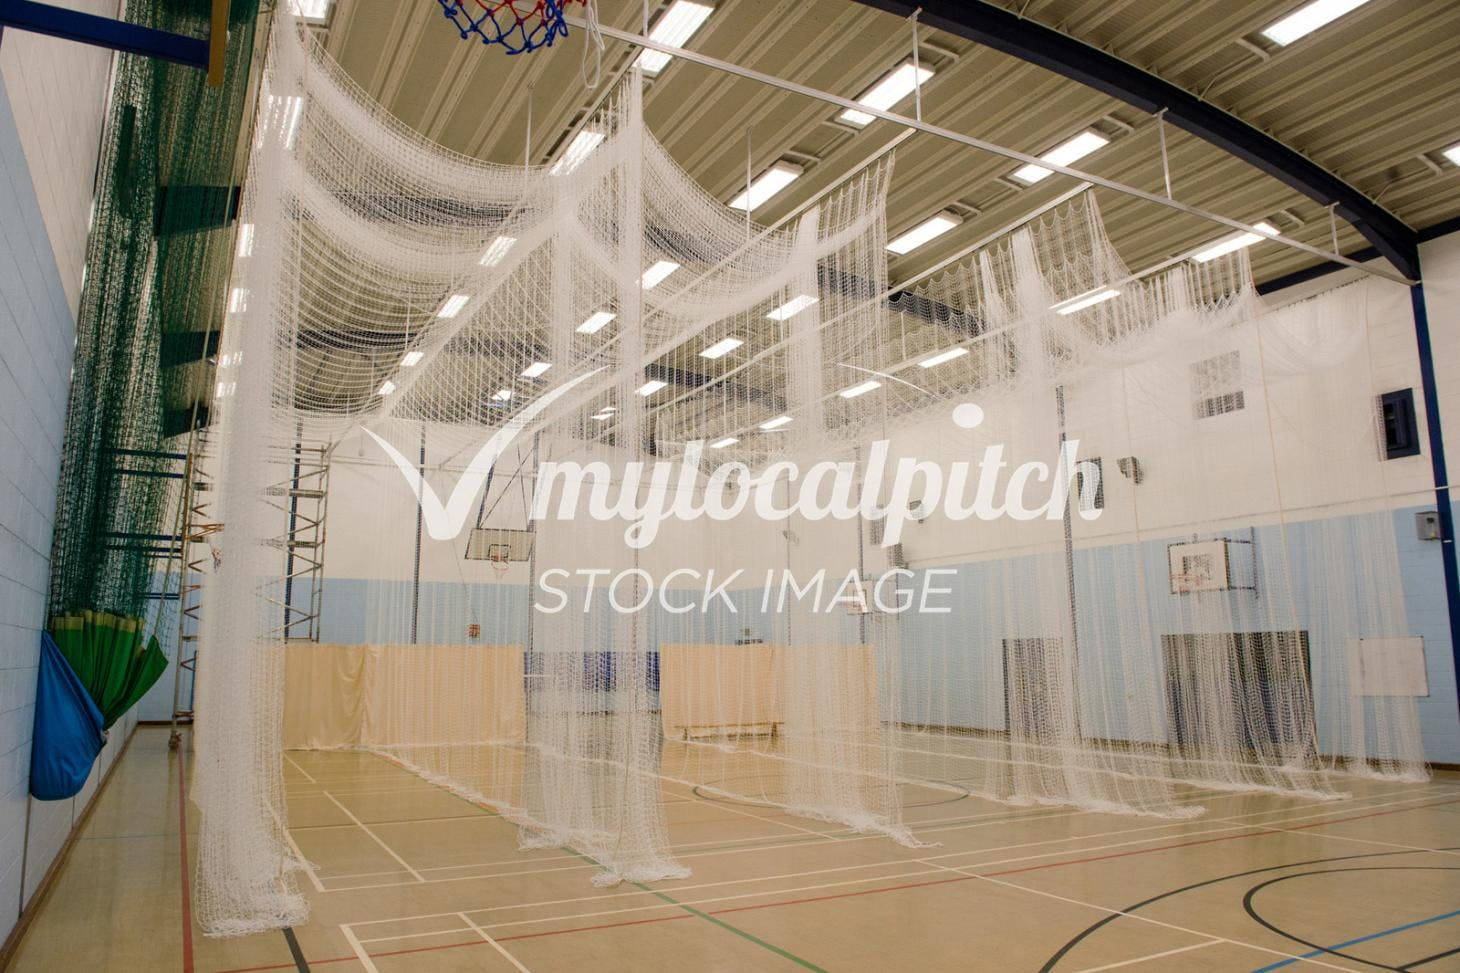 Eastbrook School Nets   Sports hall cricket facilities